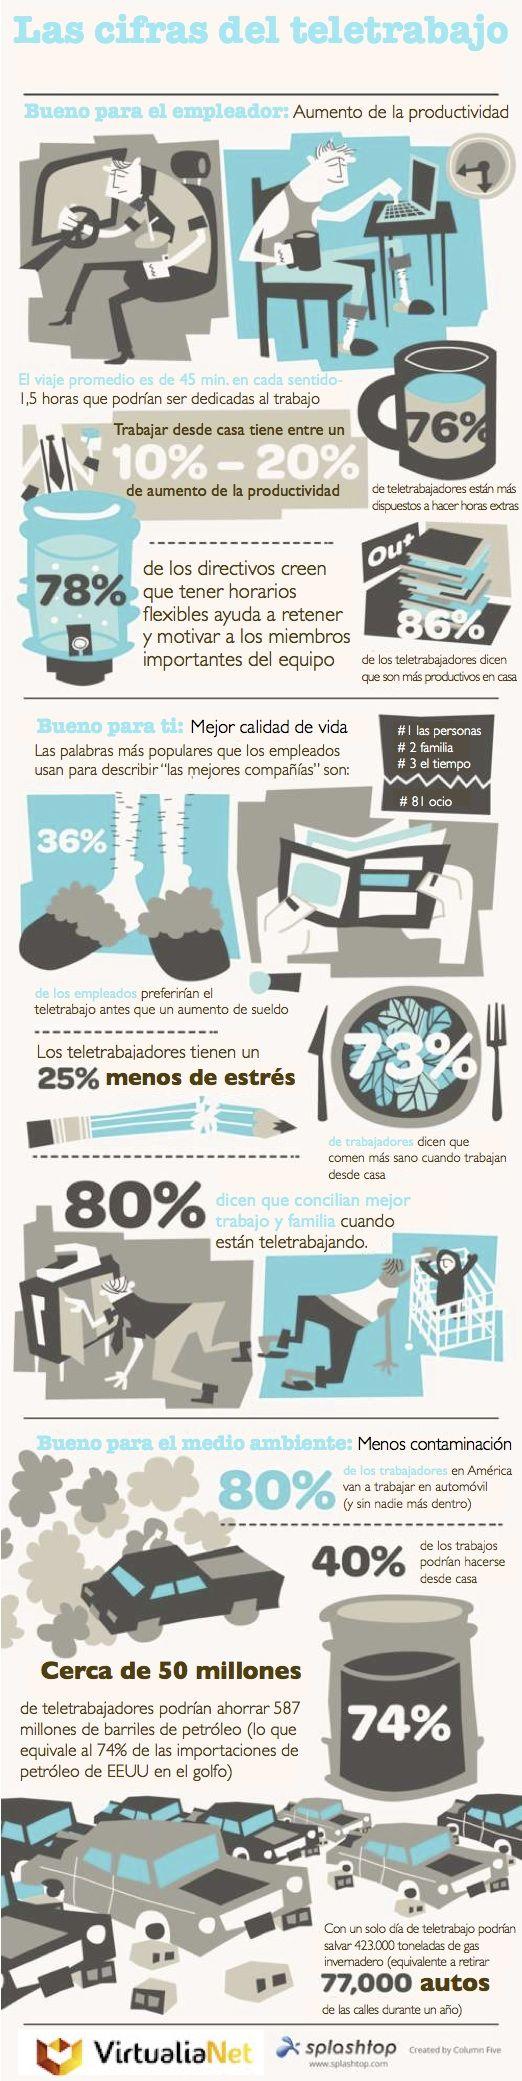 Las cifras del #Teletrabajo #infografia #empleo   http://erafbadia.blogspot.com.es/ @erafbadia